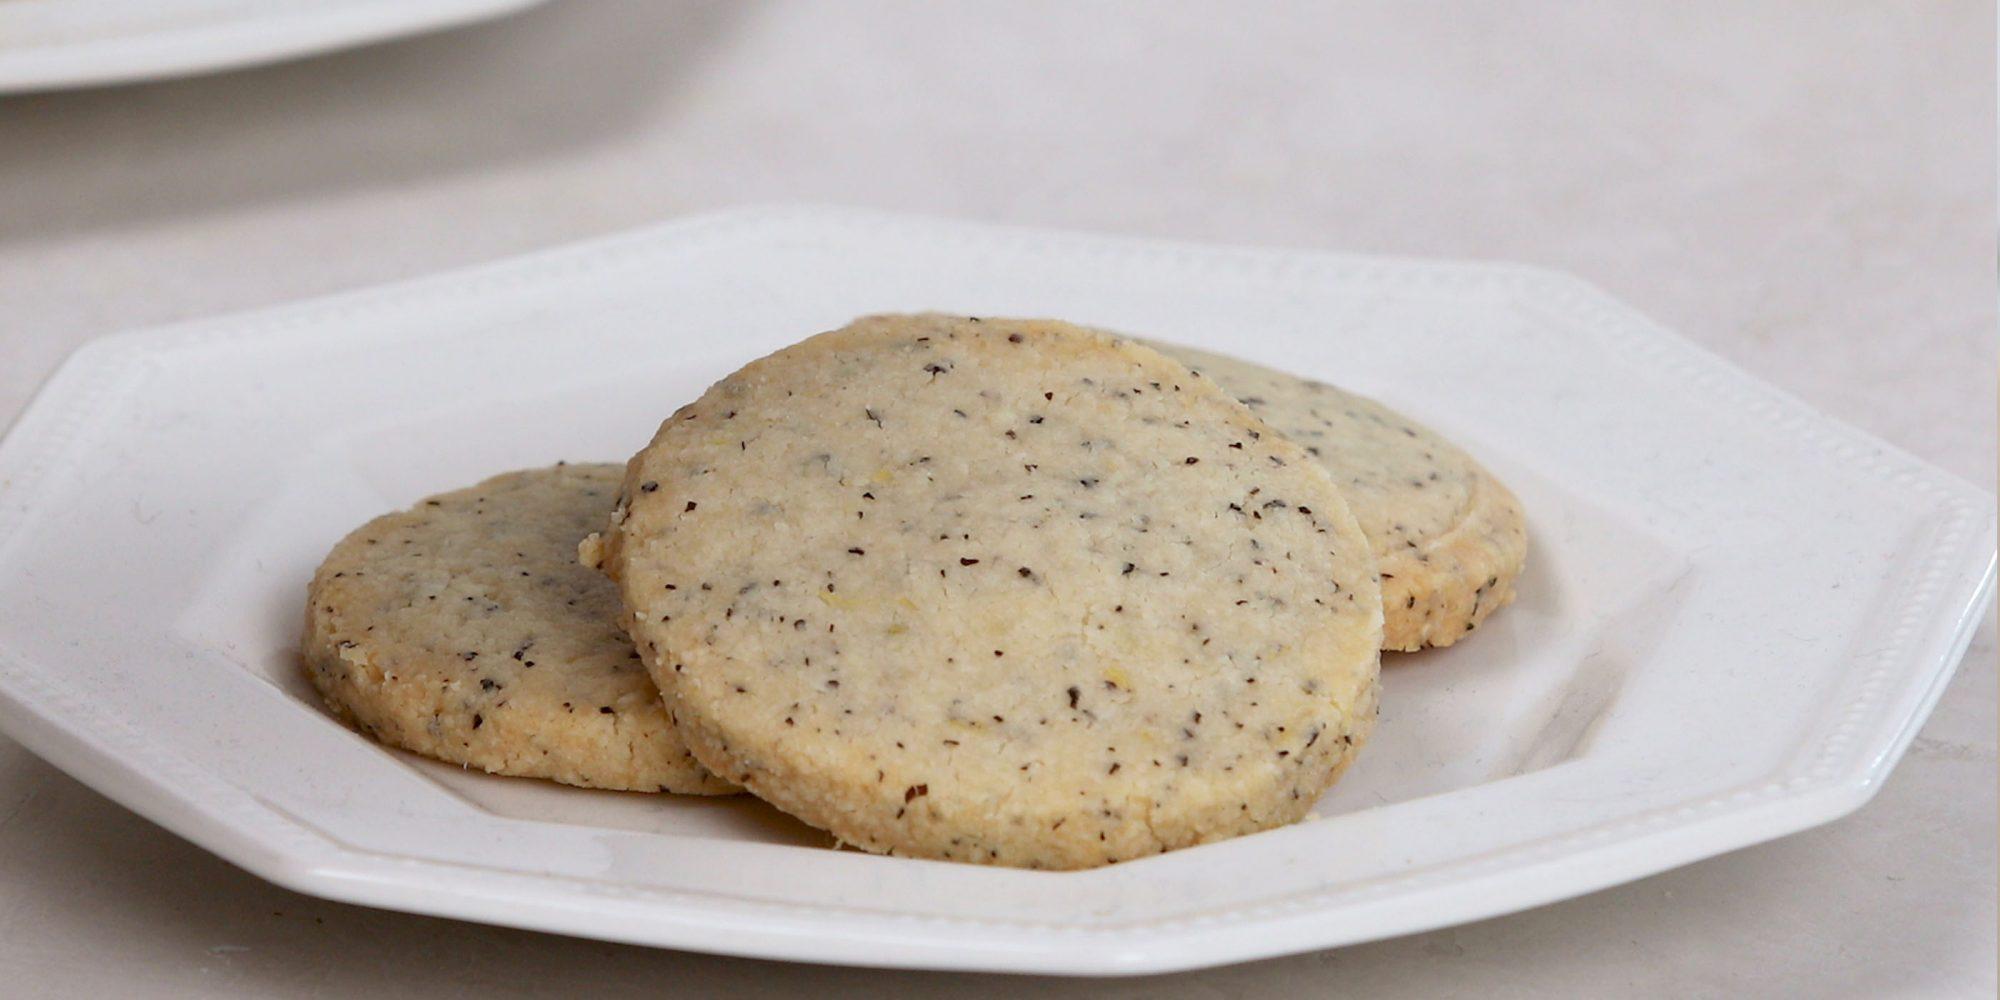 London Fog Shortbread Cookies